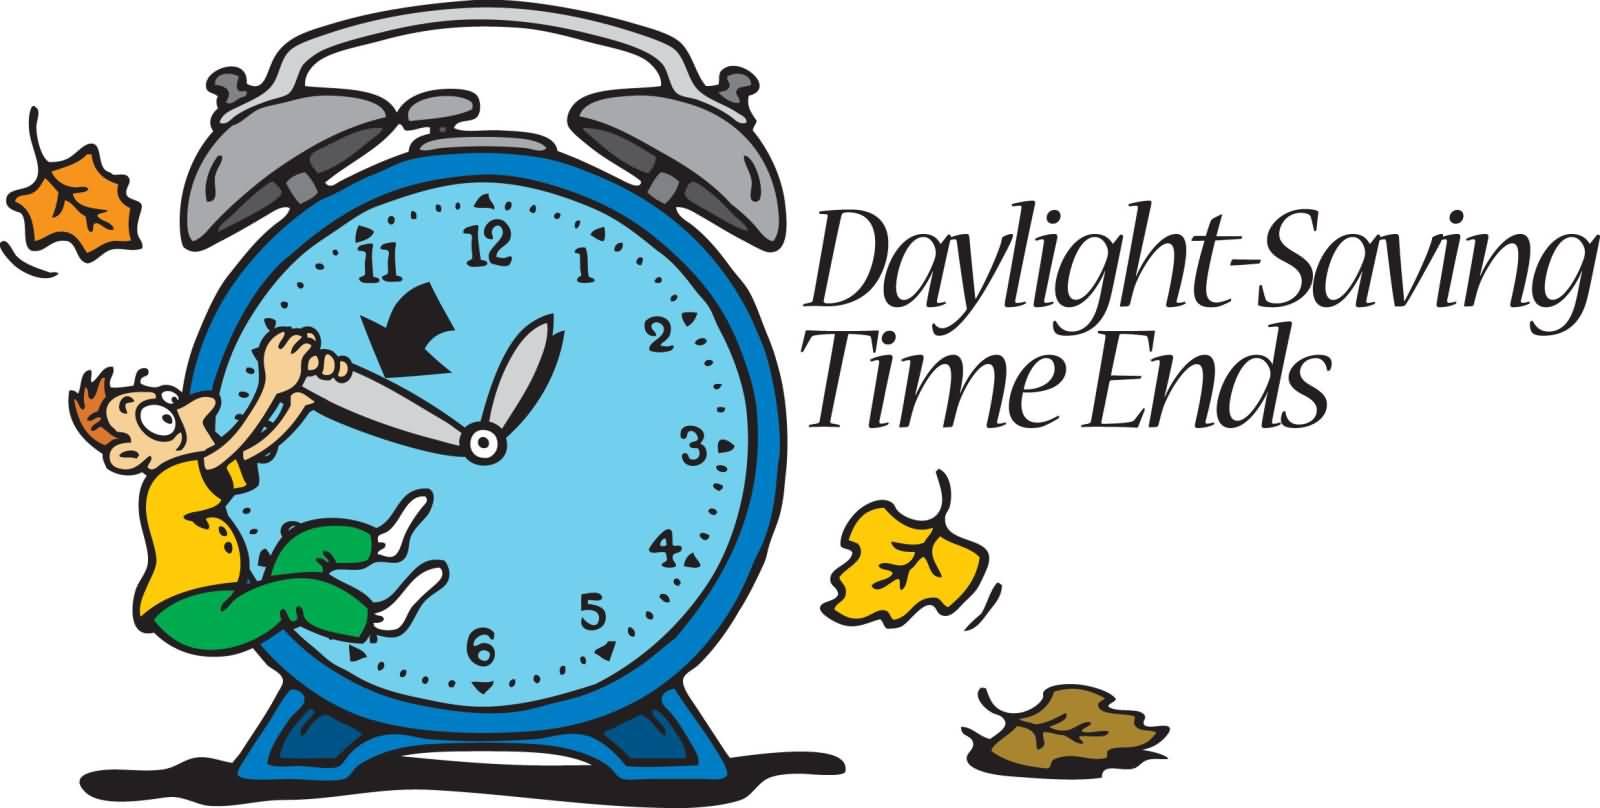 Daylight Saving Time Ends ..